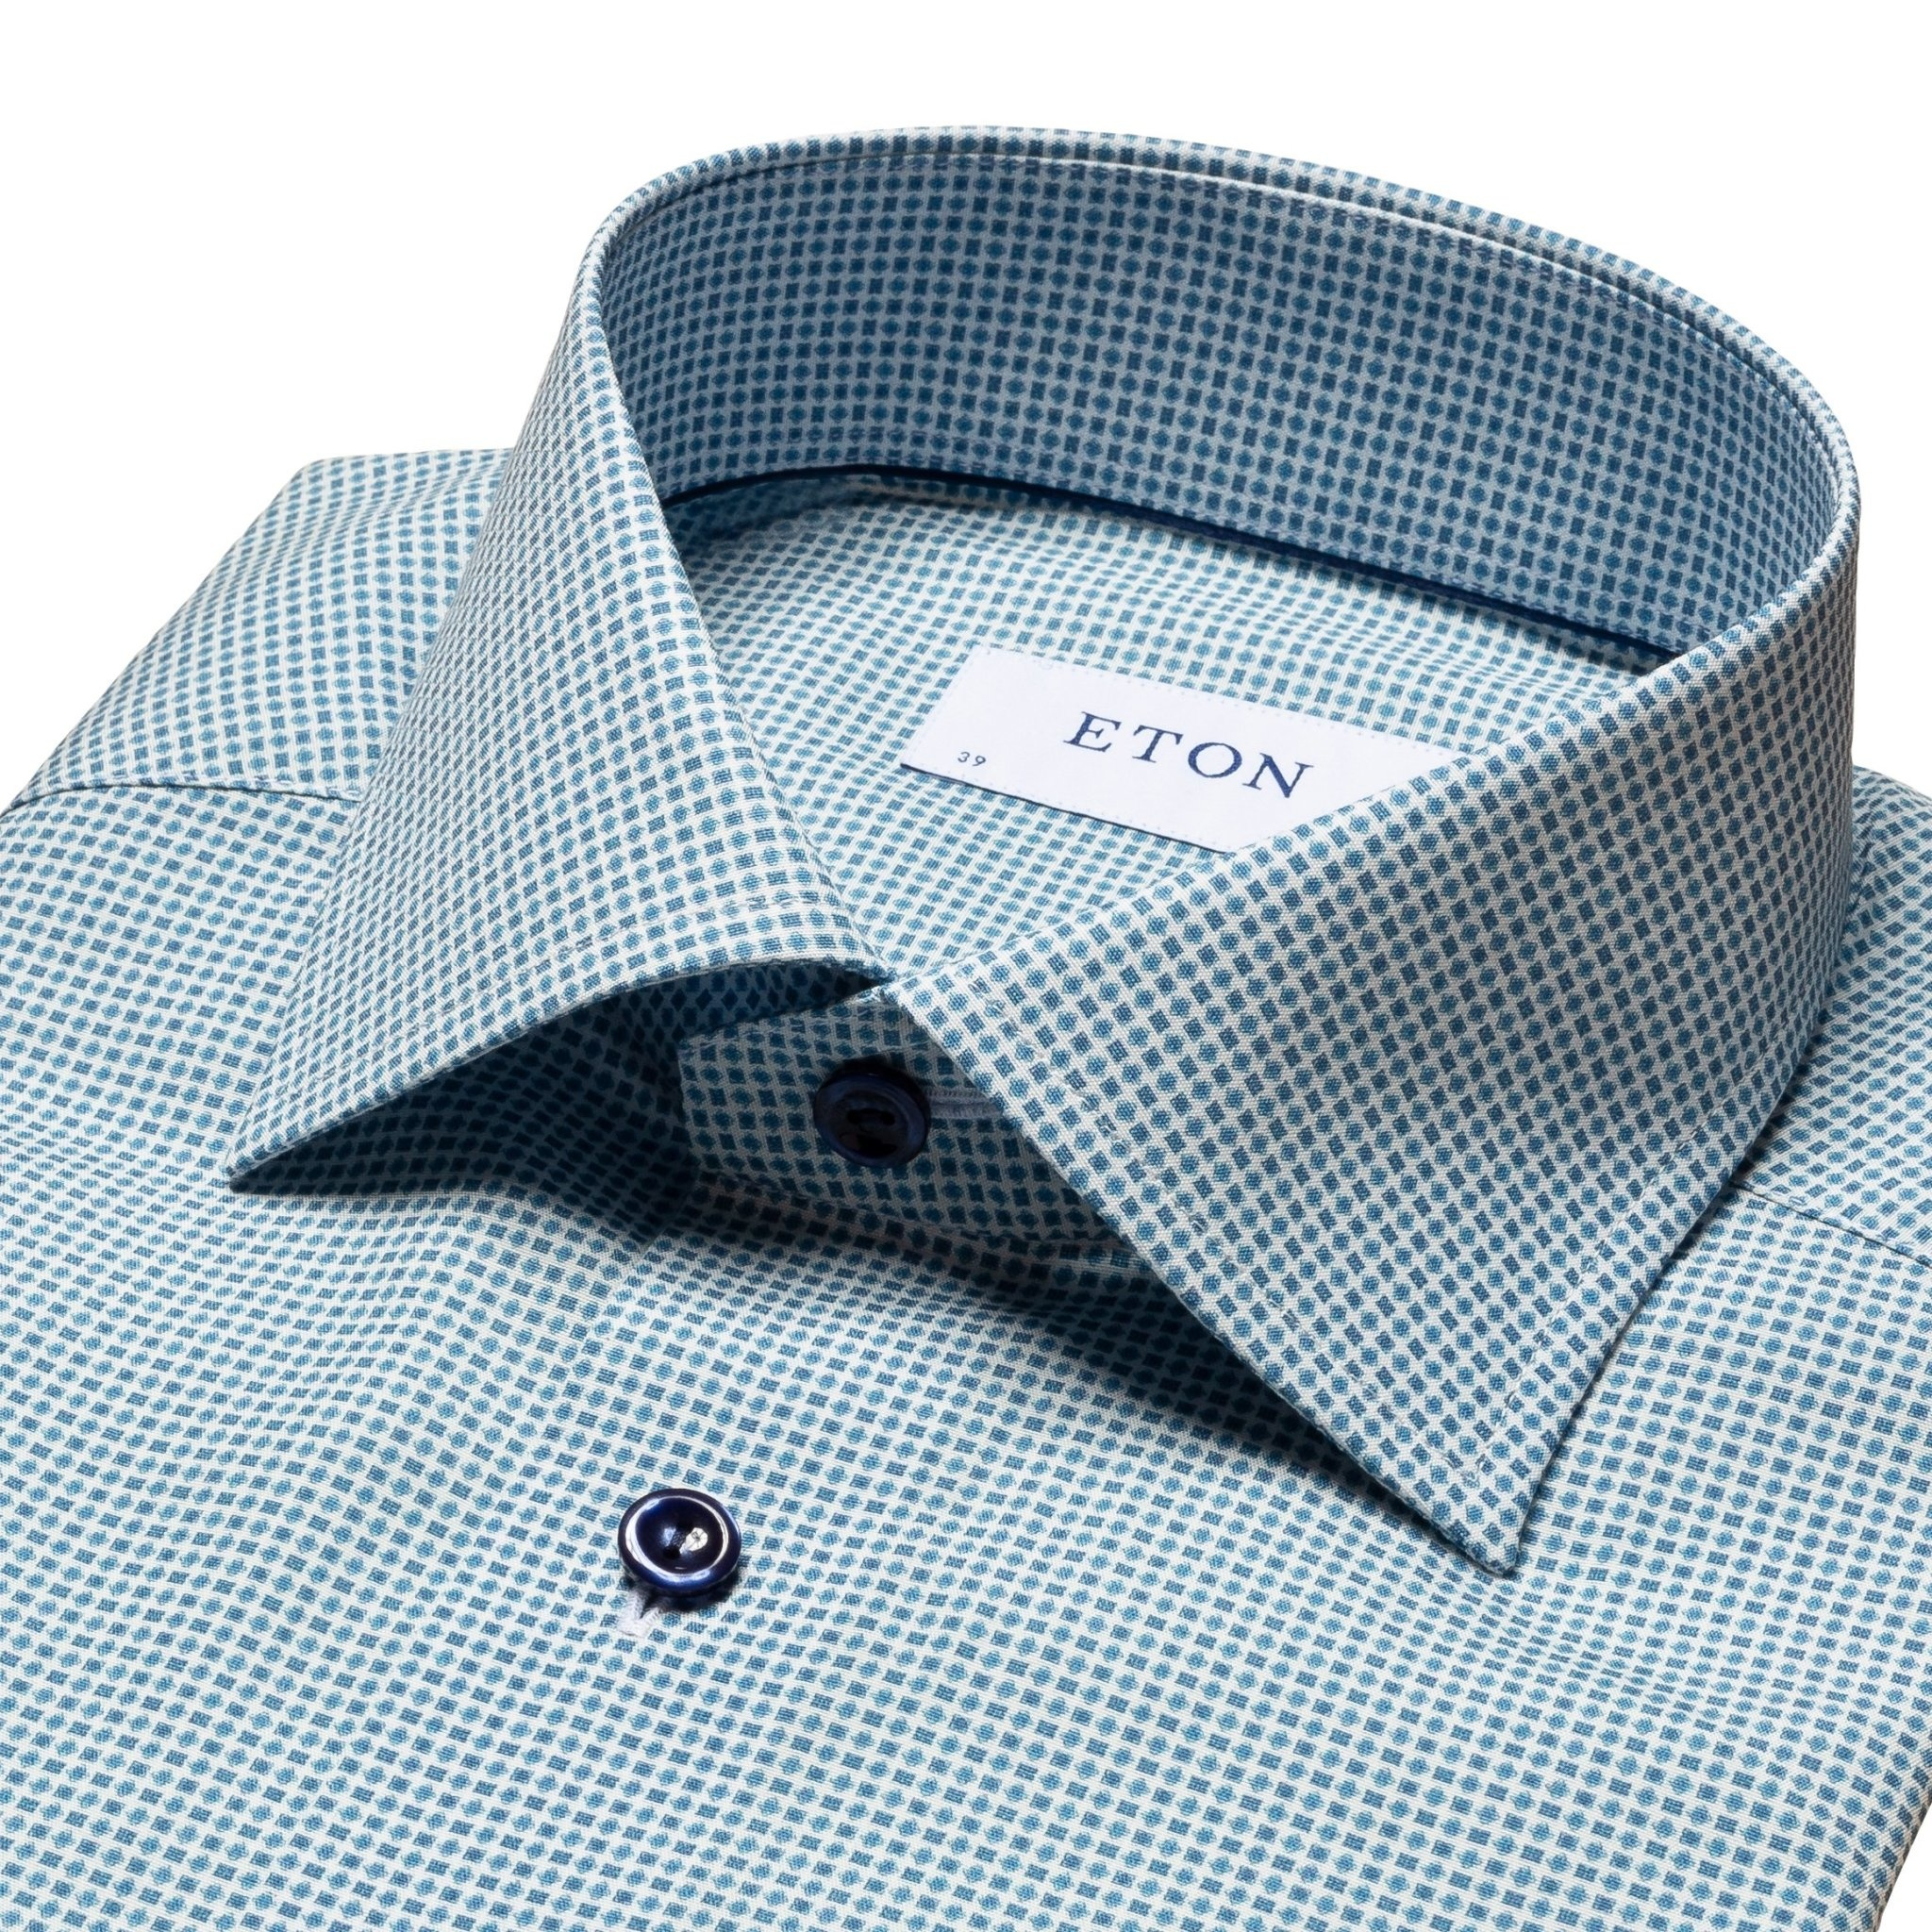 Eton Geometric Poplin with Blue Button